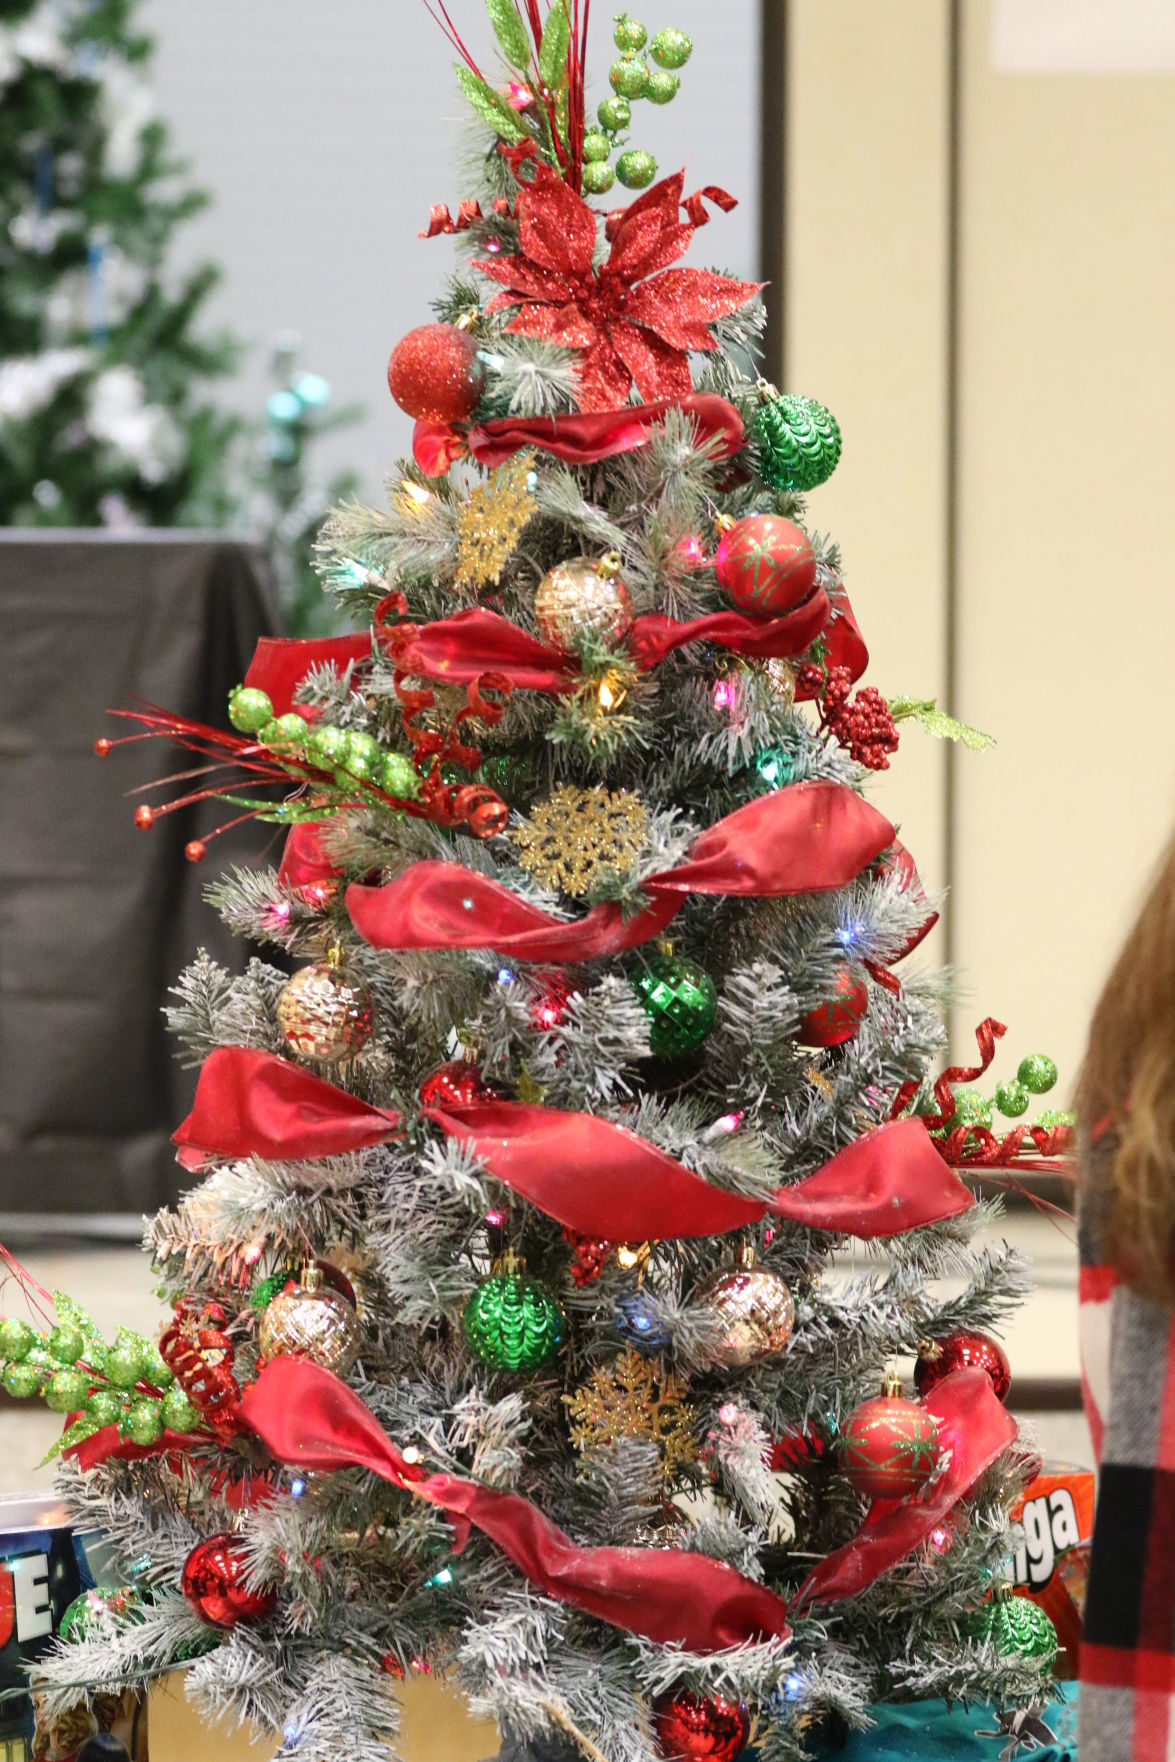 Scenes from Hacienda Elementary 2018 Christmas Tree Raffle 12-7-18